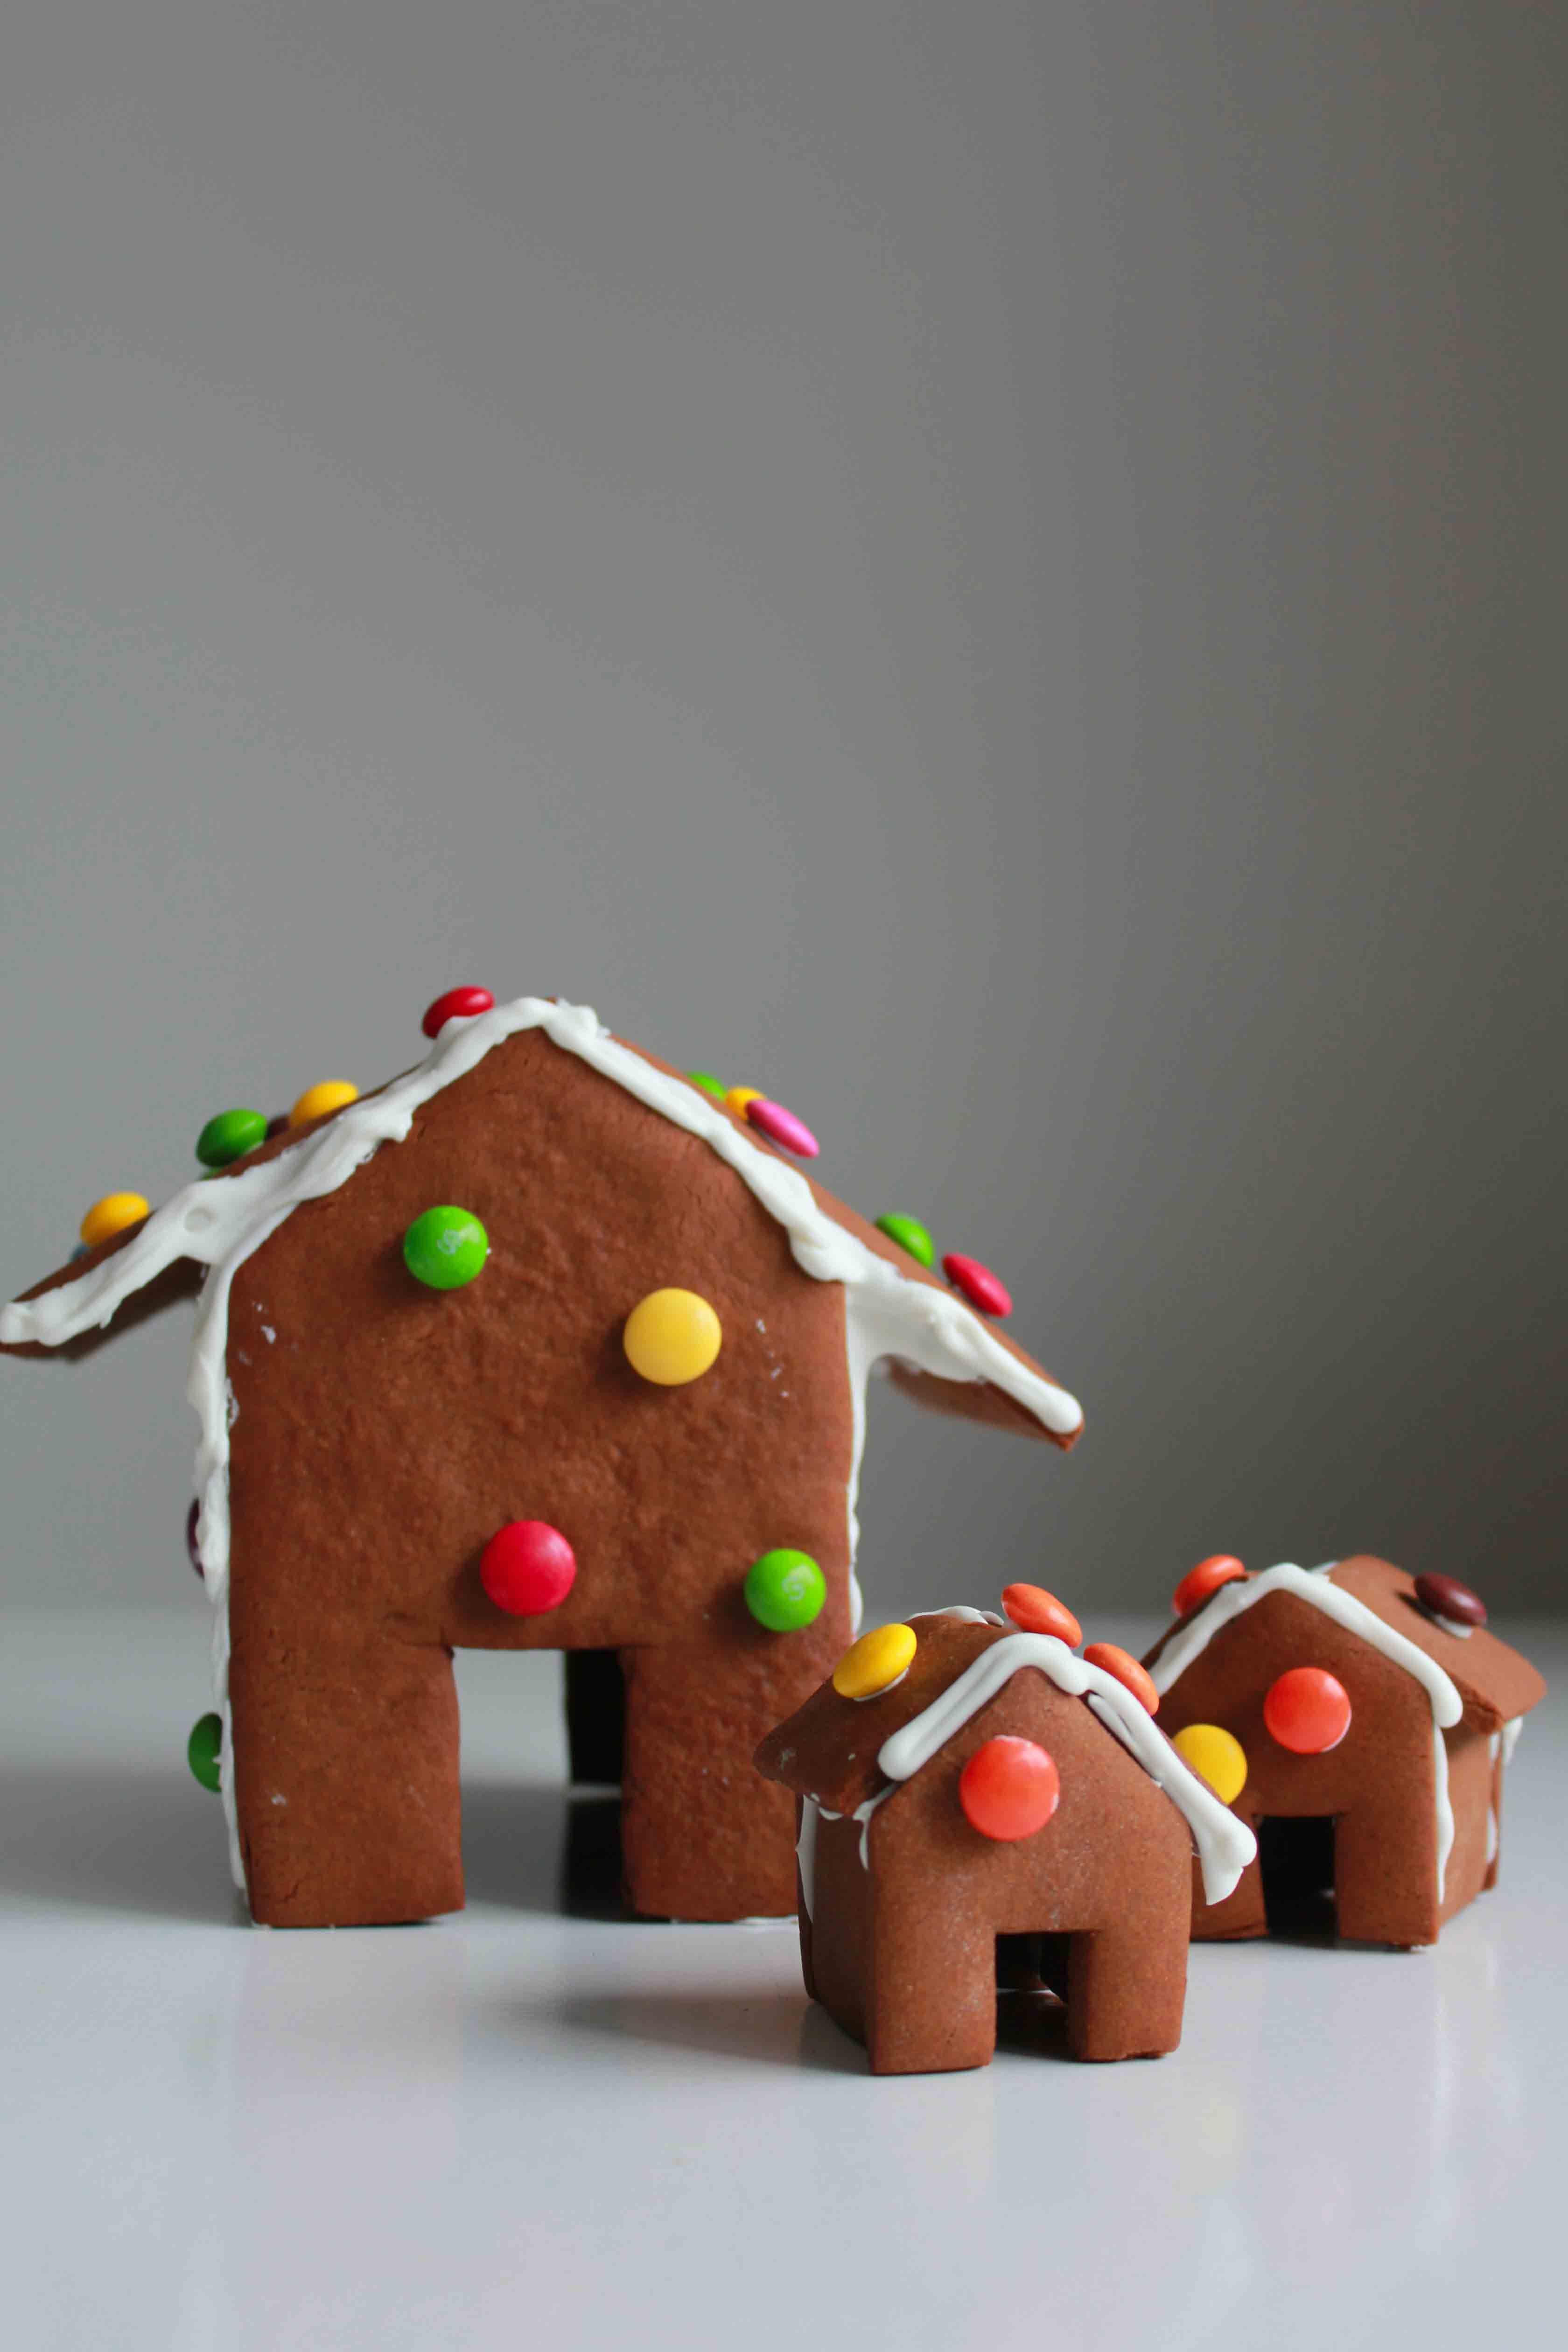 DIY Gingerbread House Ginger bread house diy